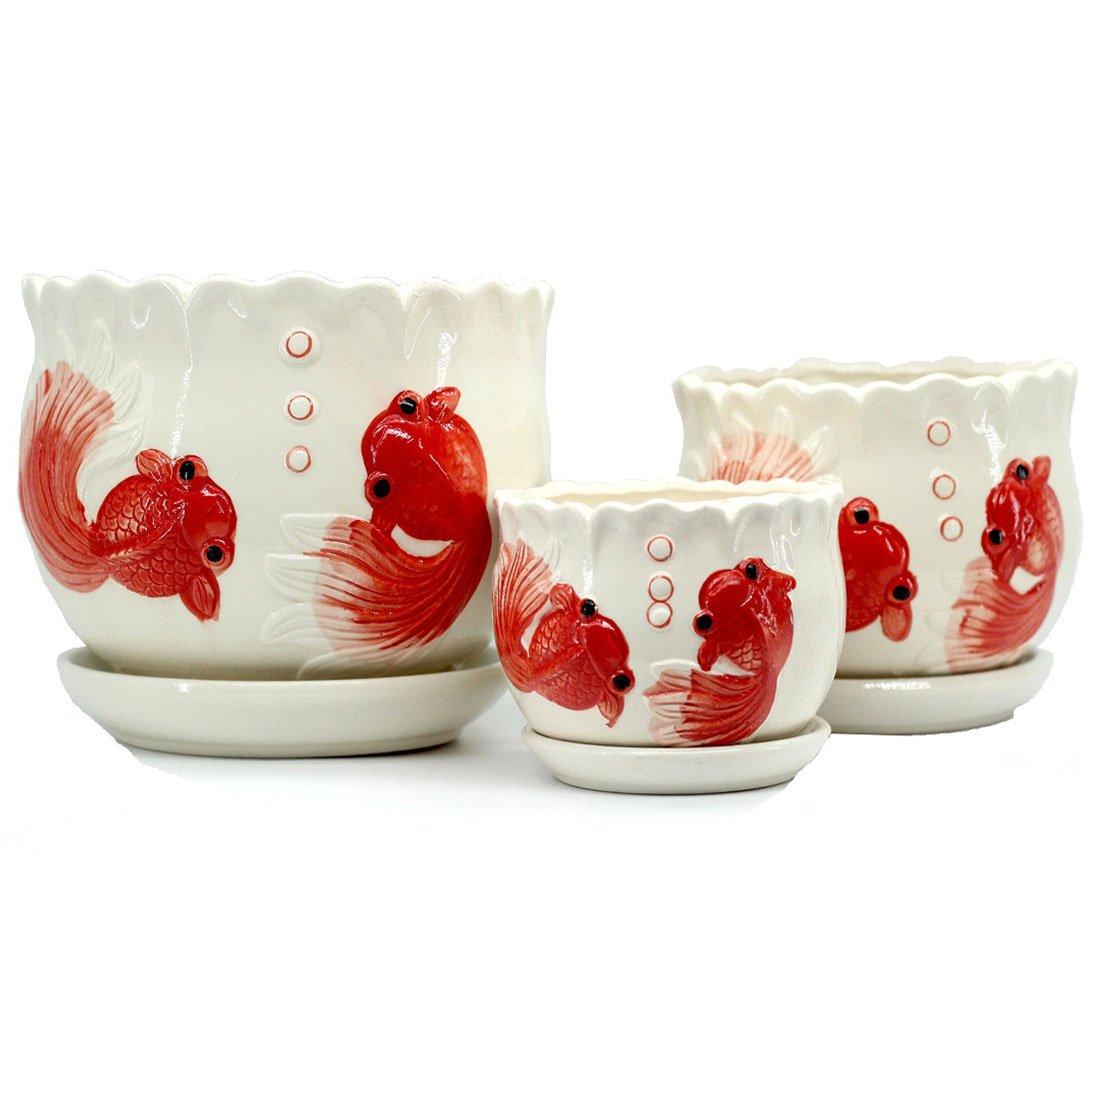 Mecai Set of 3 Medium Sized Ceramic Fish Planter Home/Garden Modern Flower Planter Pot with Saucer/Tray